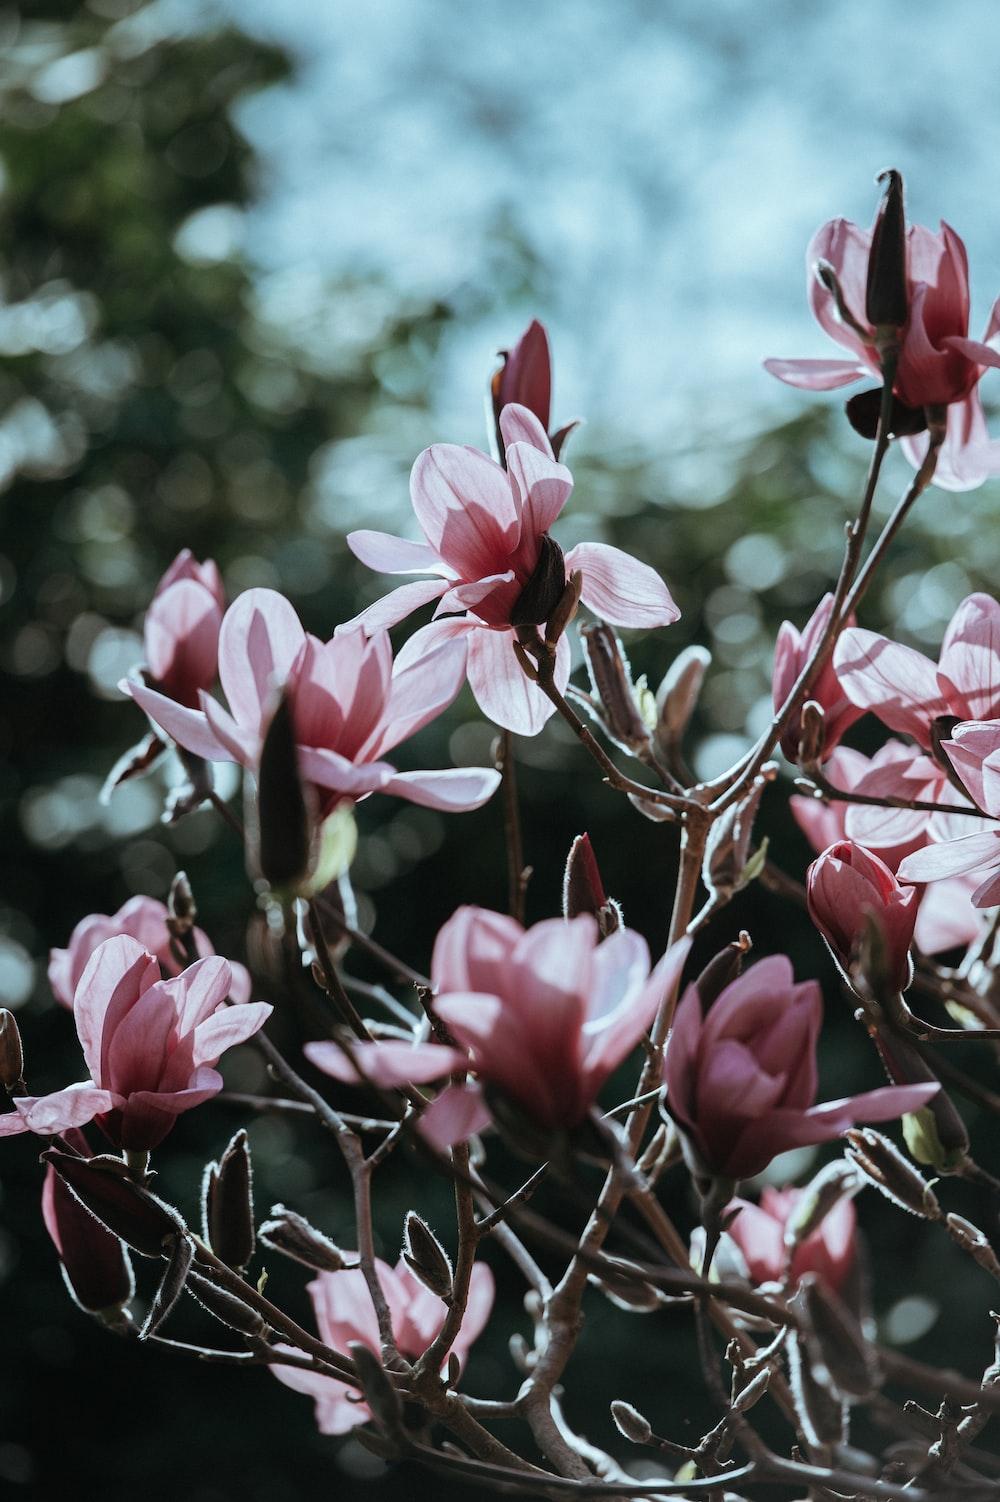 closeup photogragy of pink petaled flowers